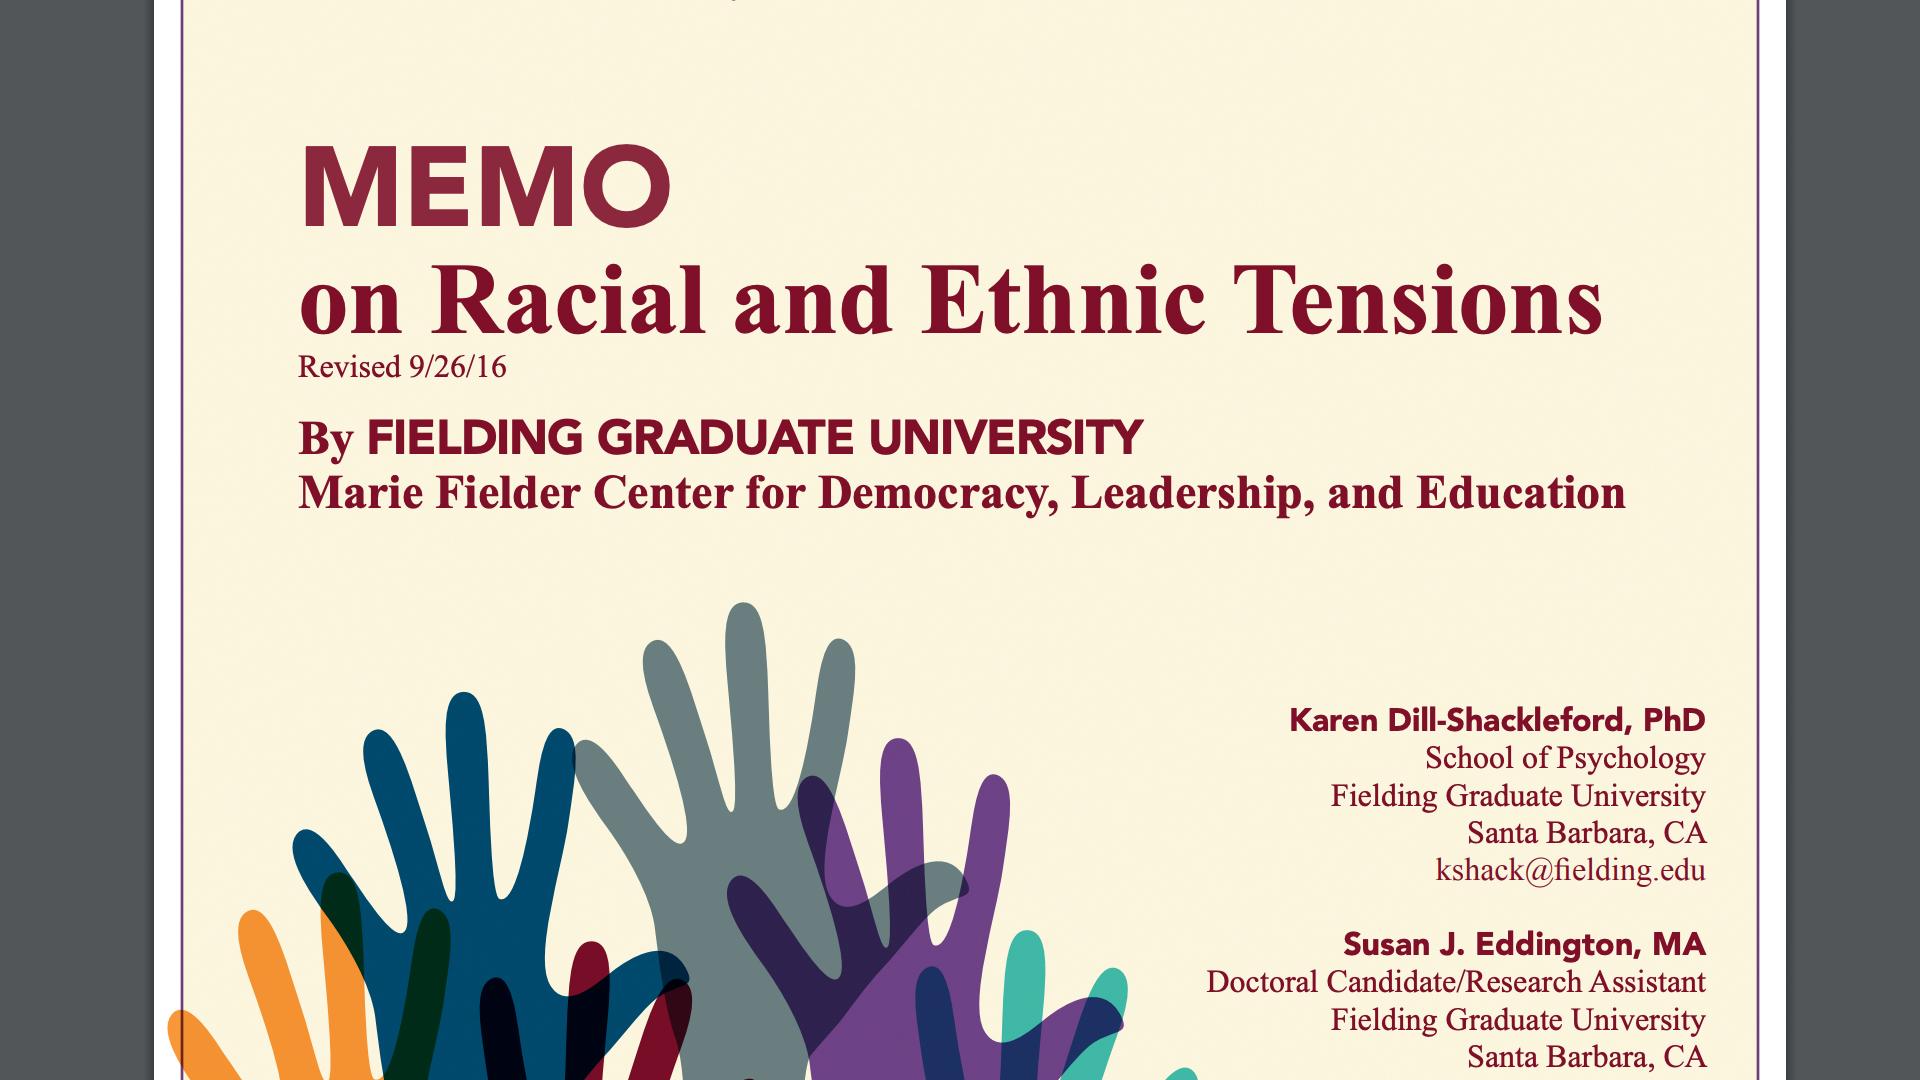 Memo on Racial Tension